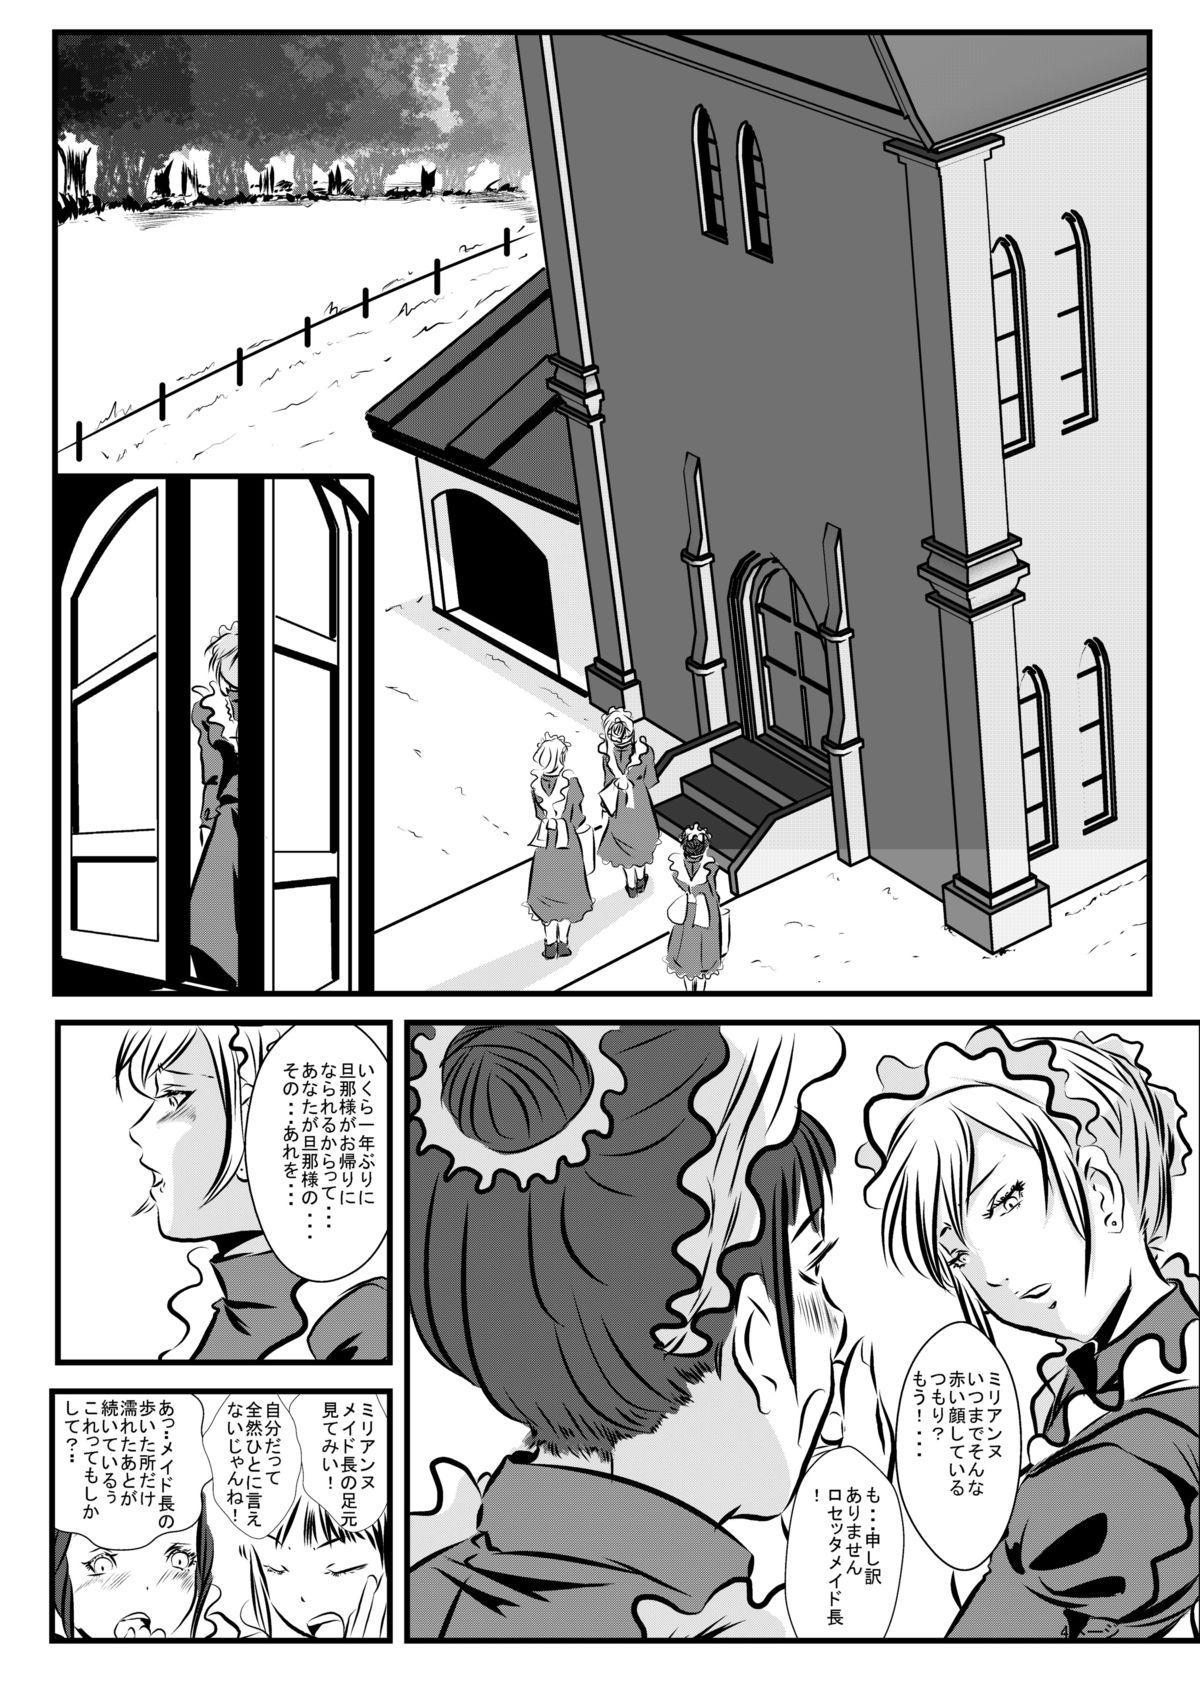 Loli Type no Jikkensitsu 2